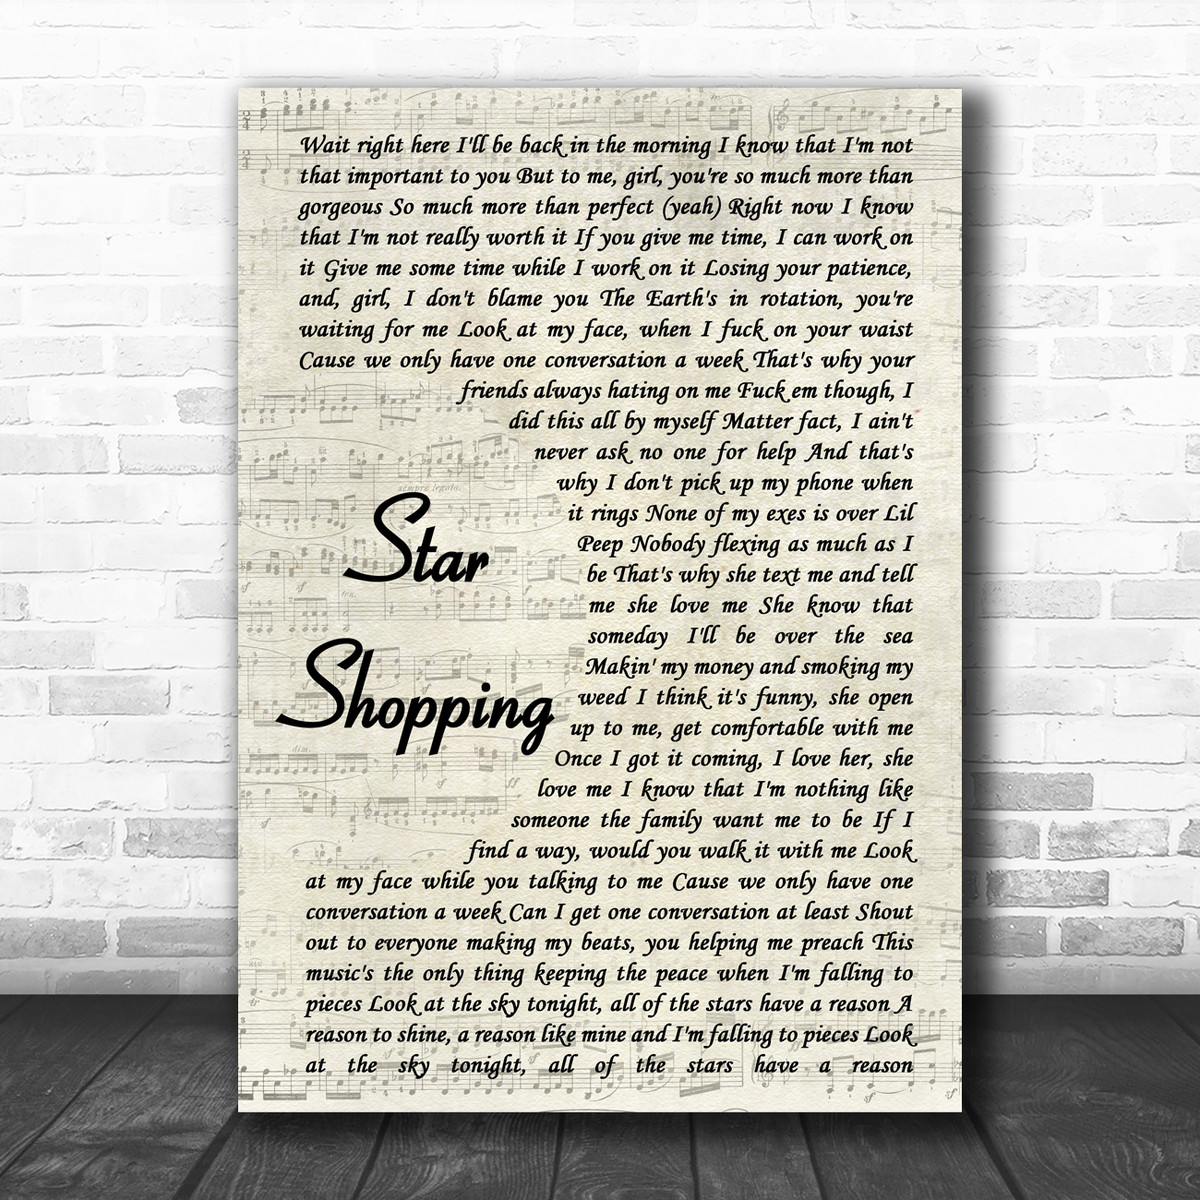 lil peep star shopping vintage script song lyric music poster print